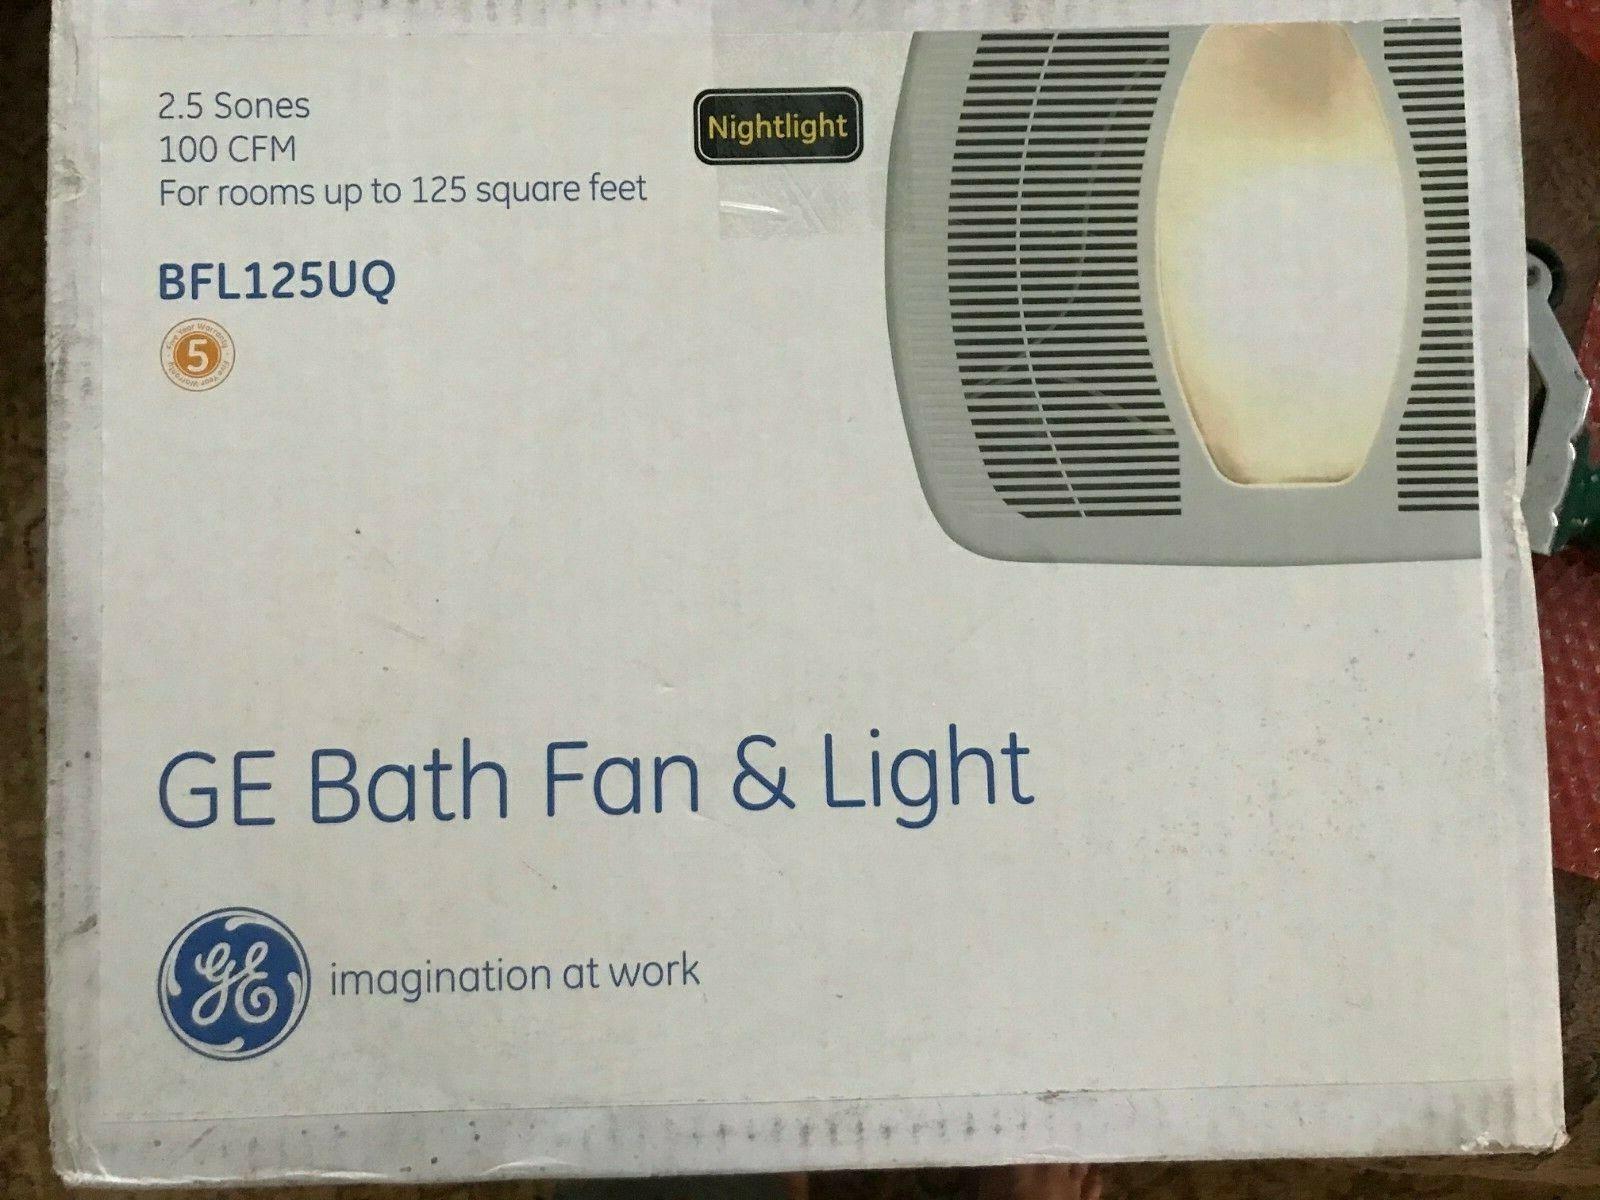 Ge Bathroom Exhaust Fan 130 Cfm Bf130uq White Grille For Sale Online Ebay